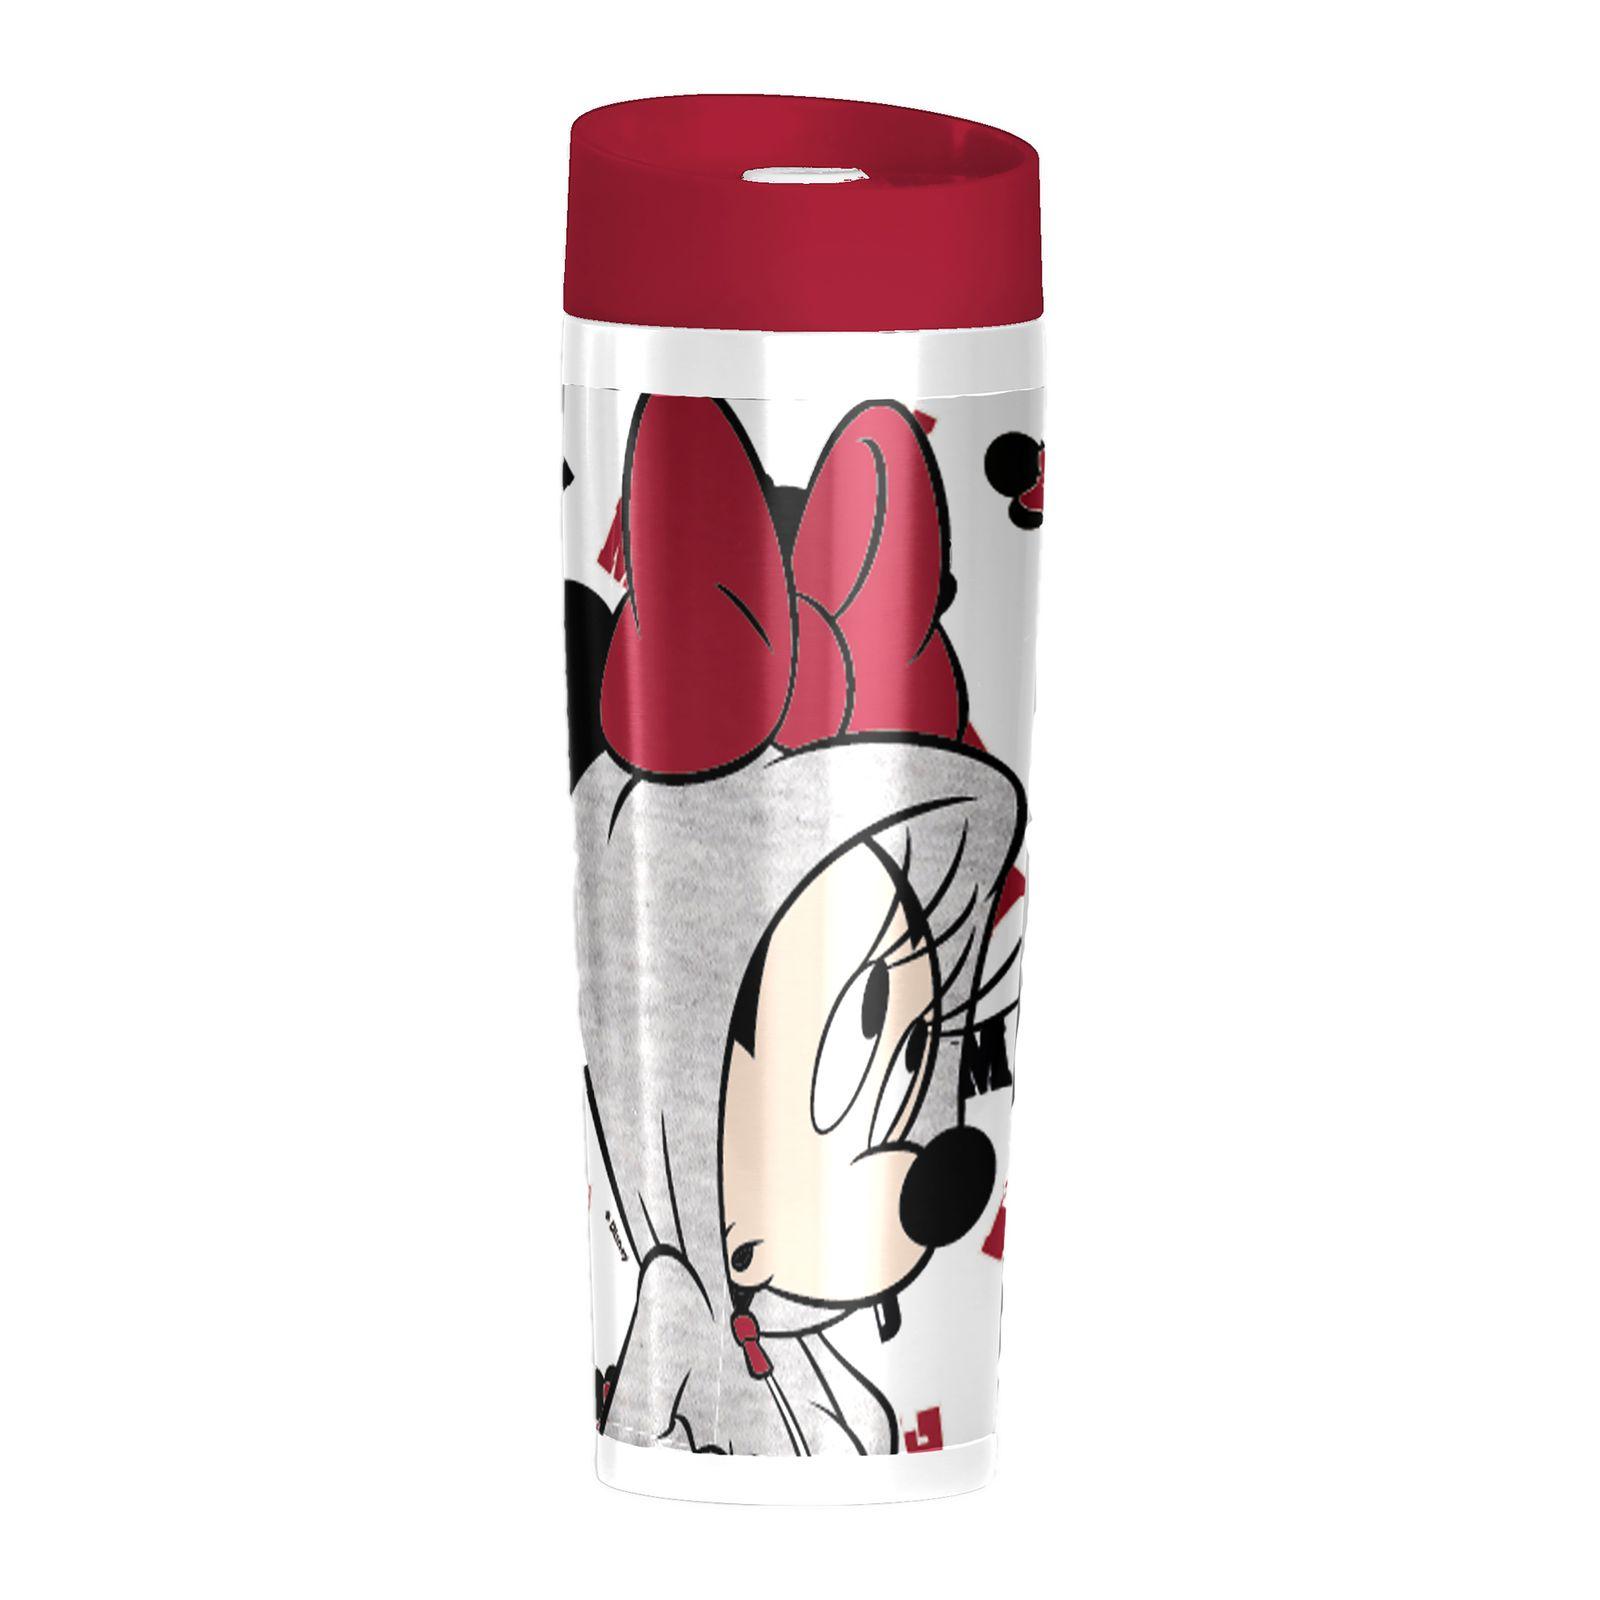 Tasse isotherme Minnie Legend 40 cl DISNEY